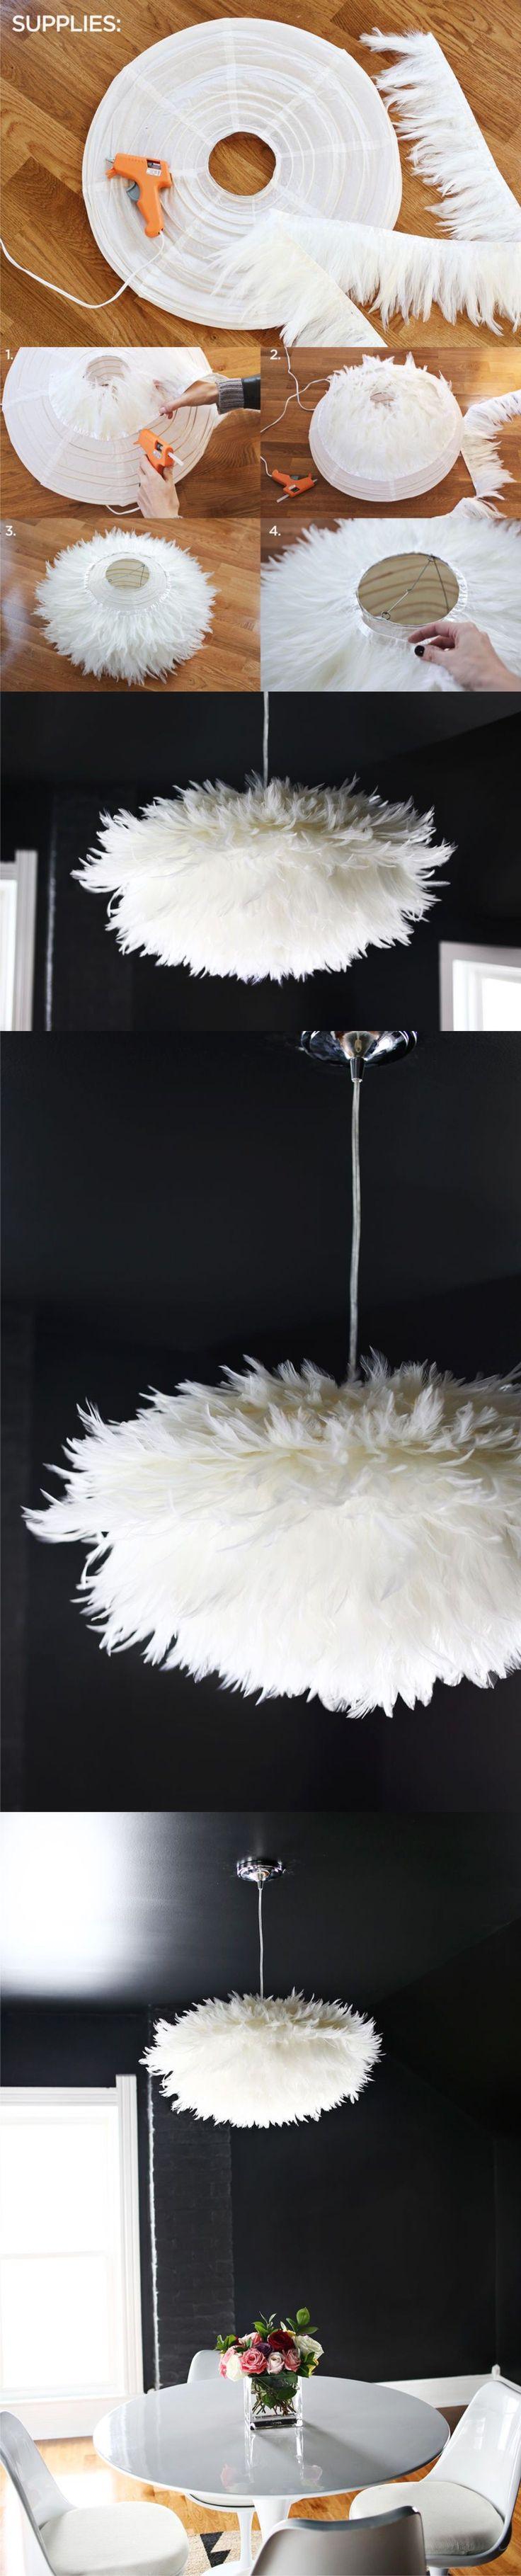 Lámpara con plumas / Via www.abeautifulmess.com #LampDIY